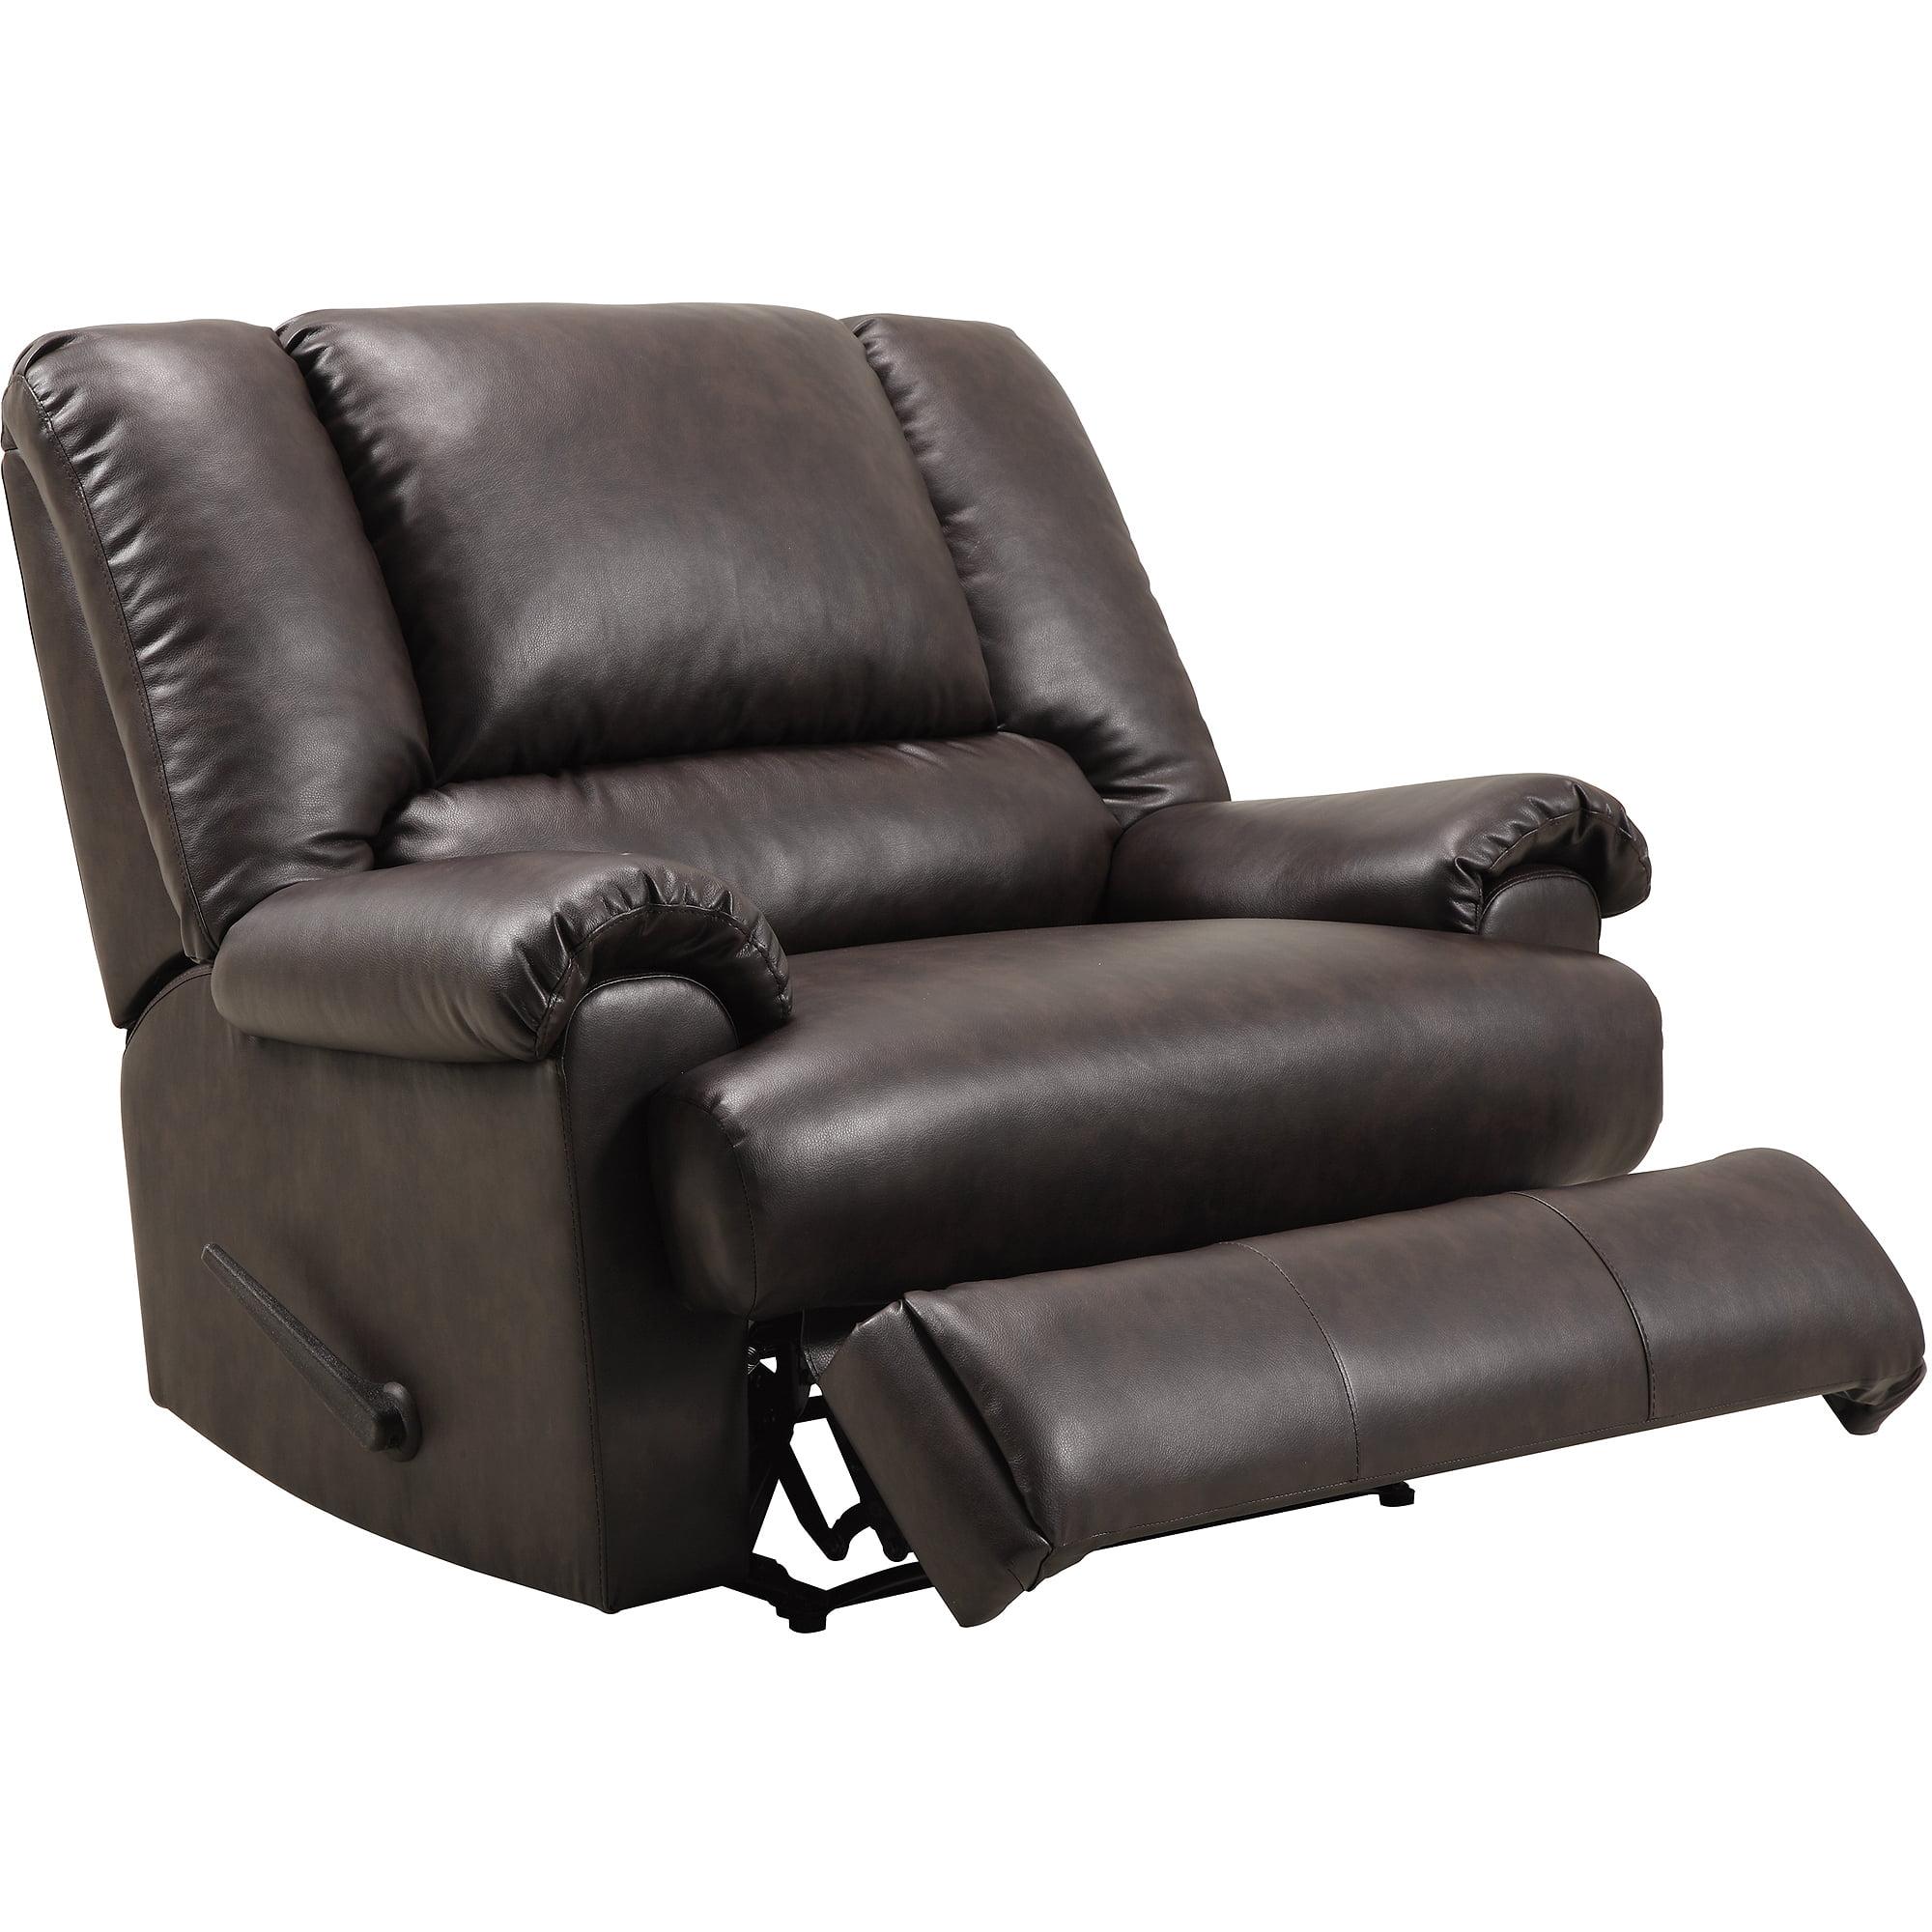 Dorel Living Stanford Chair and a Half ReclinerWalmartcom